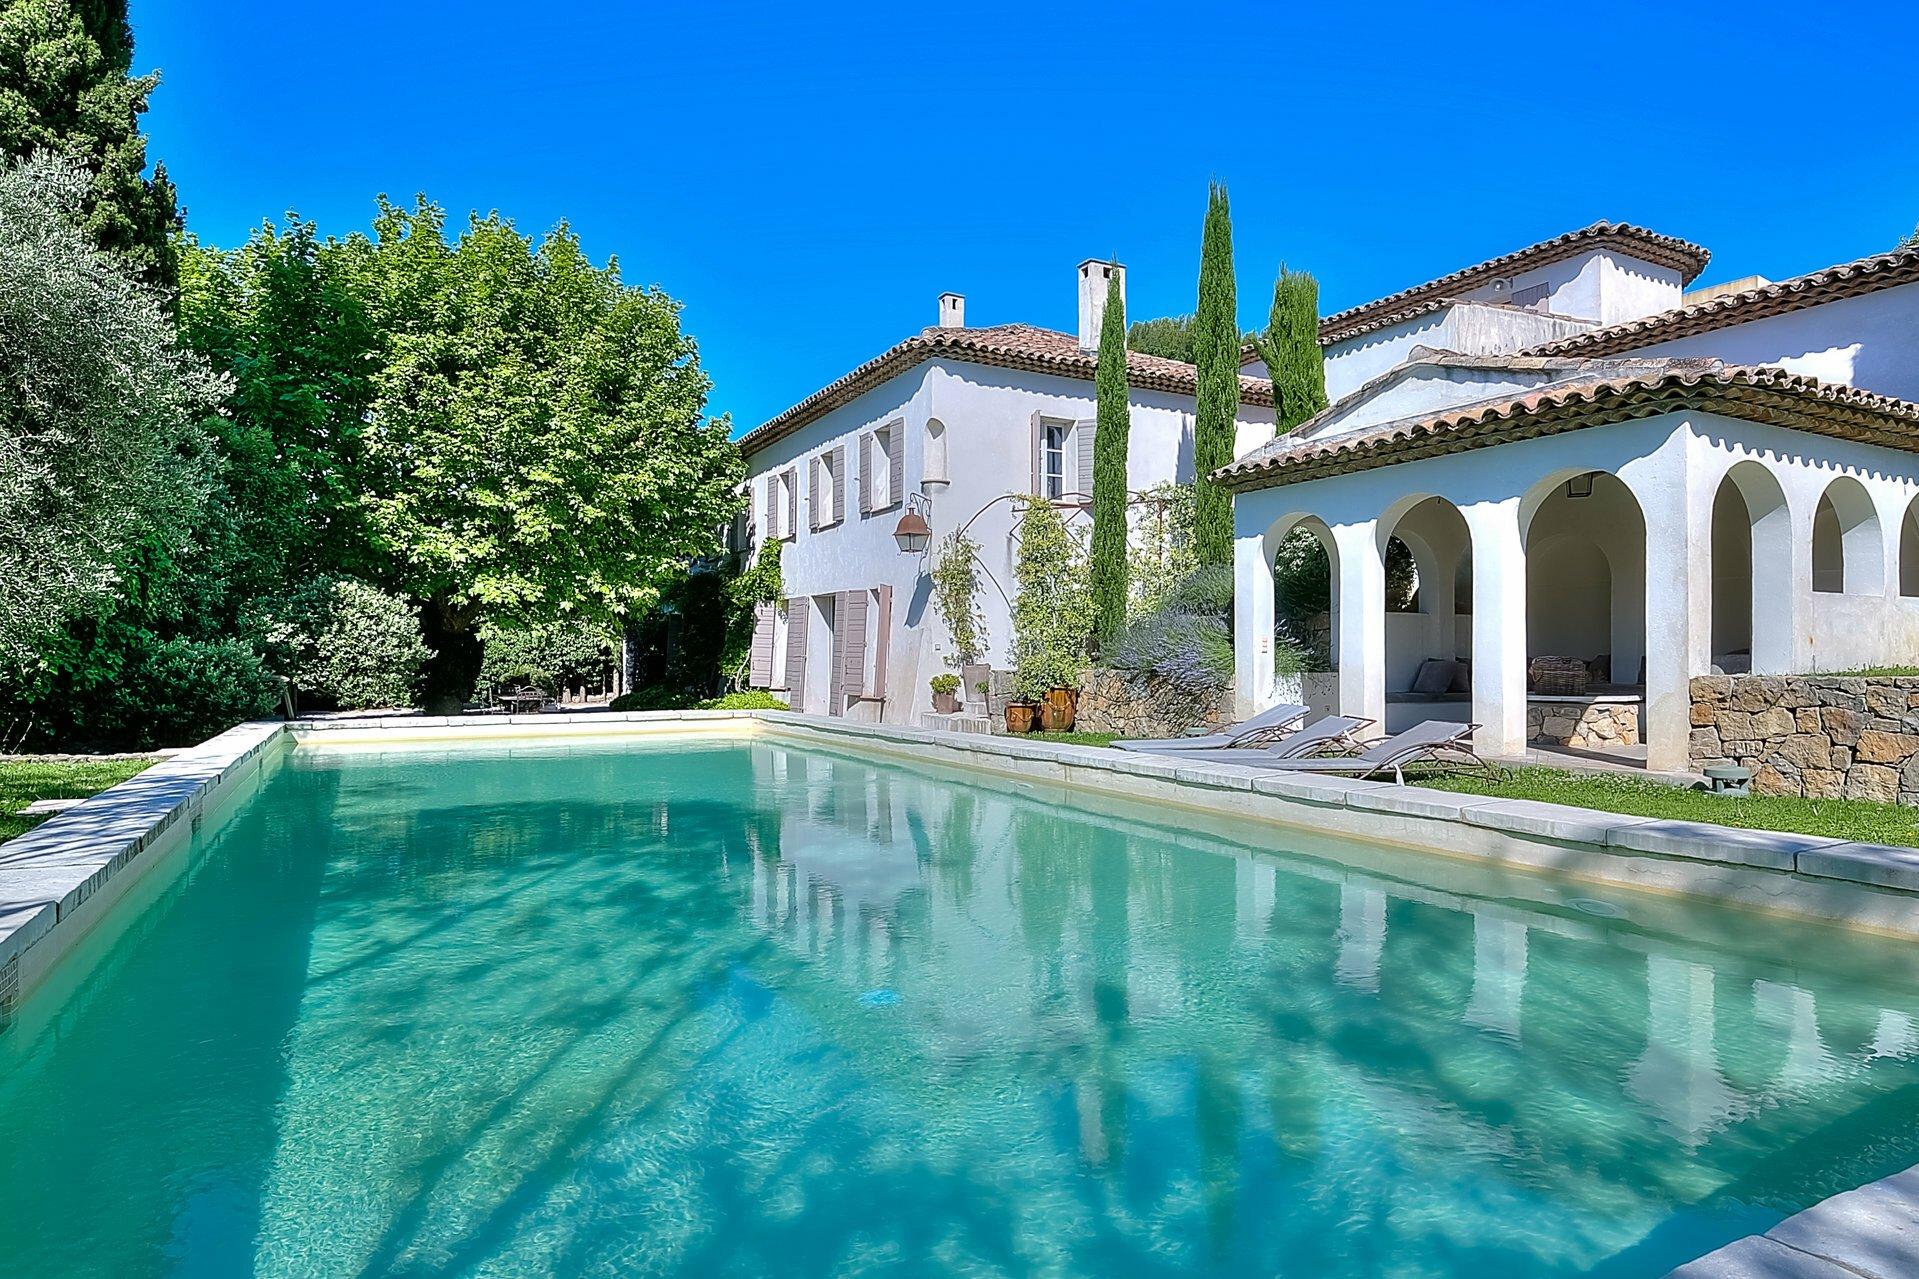 Villa in Mougins, Provence-Alpes-Côte d'Azur, France 1 - 11571243